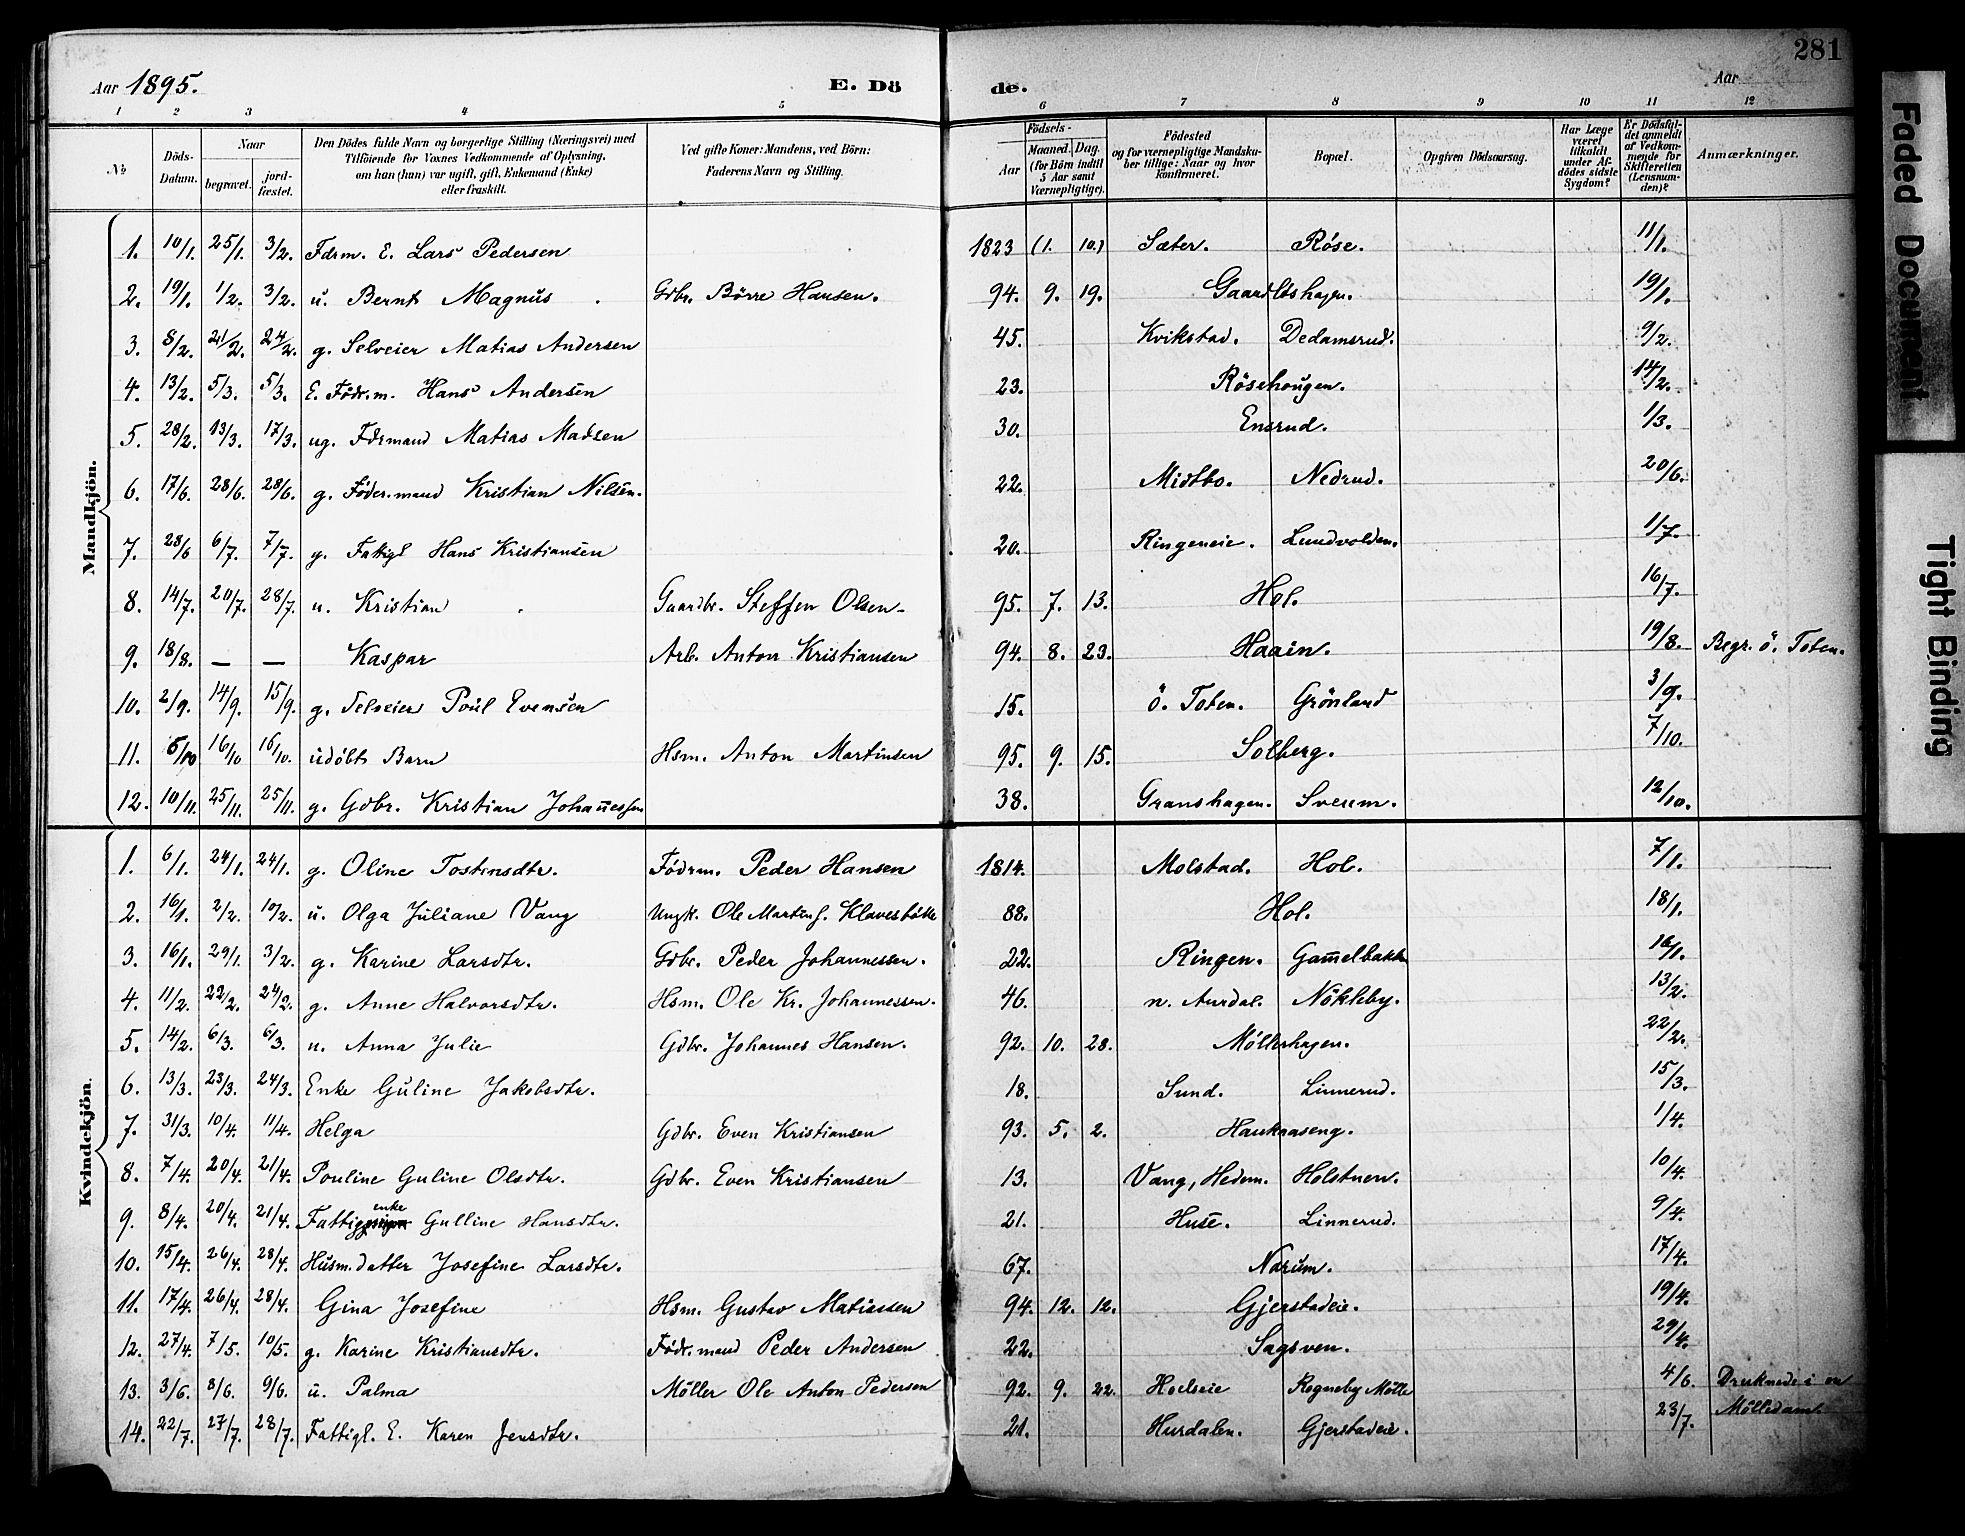 SAH, Vestre Toten prestekontor, H/Ha/Haa/L0013: Ministerialbok nr. 13, 1895-1911, s. 281